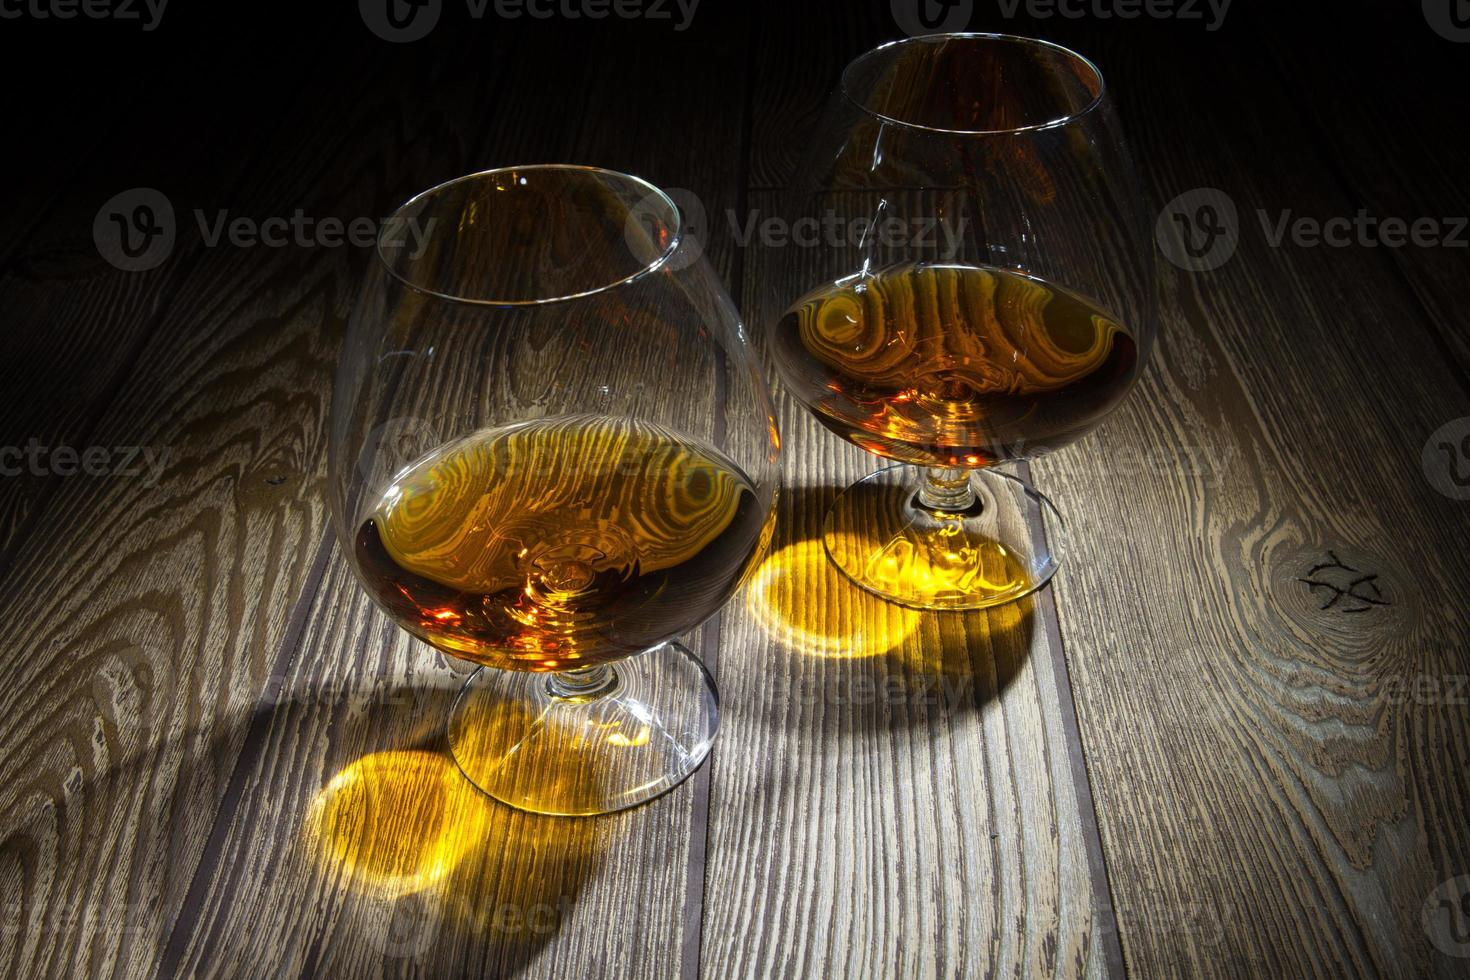 två glas konjak foto